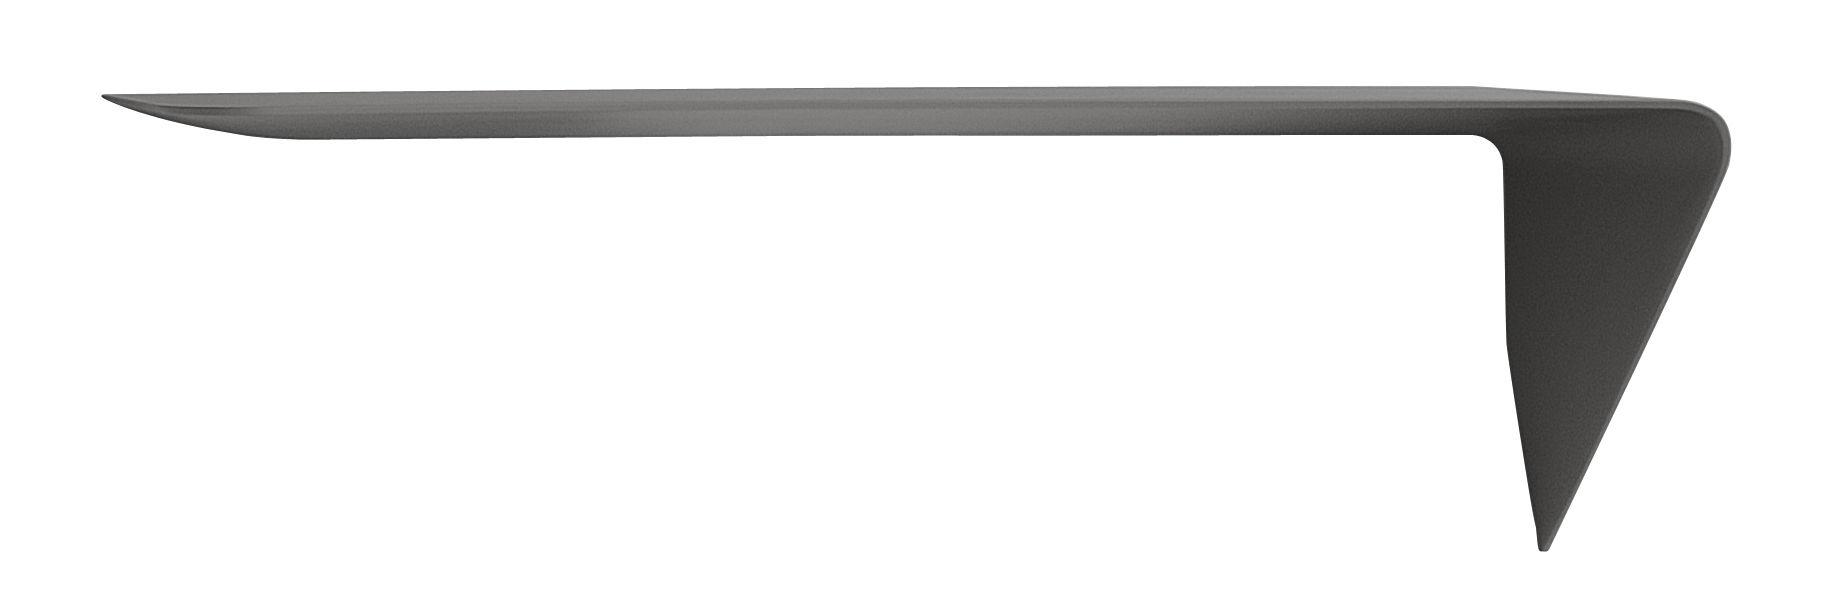 Möbel - Regale und Bücherregale - Mamba light Regal / Wandschreibtisch - Winkel rechts - L 134 cm x H 44 cm - MDF Italia - Grau - Fibre de bois